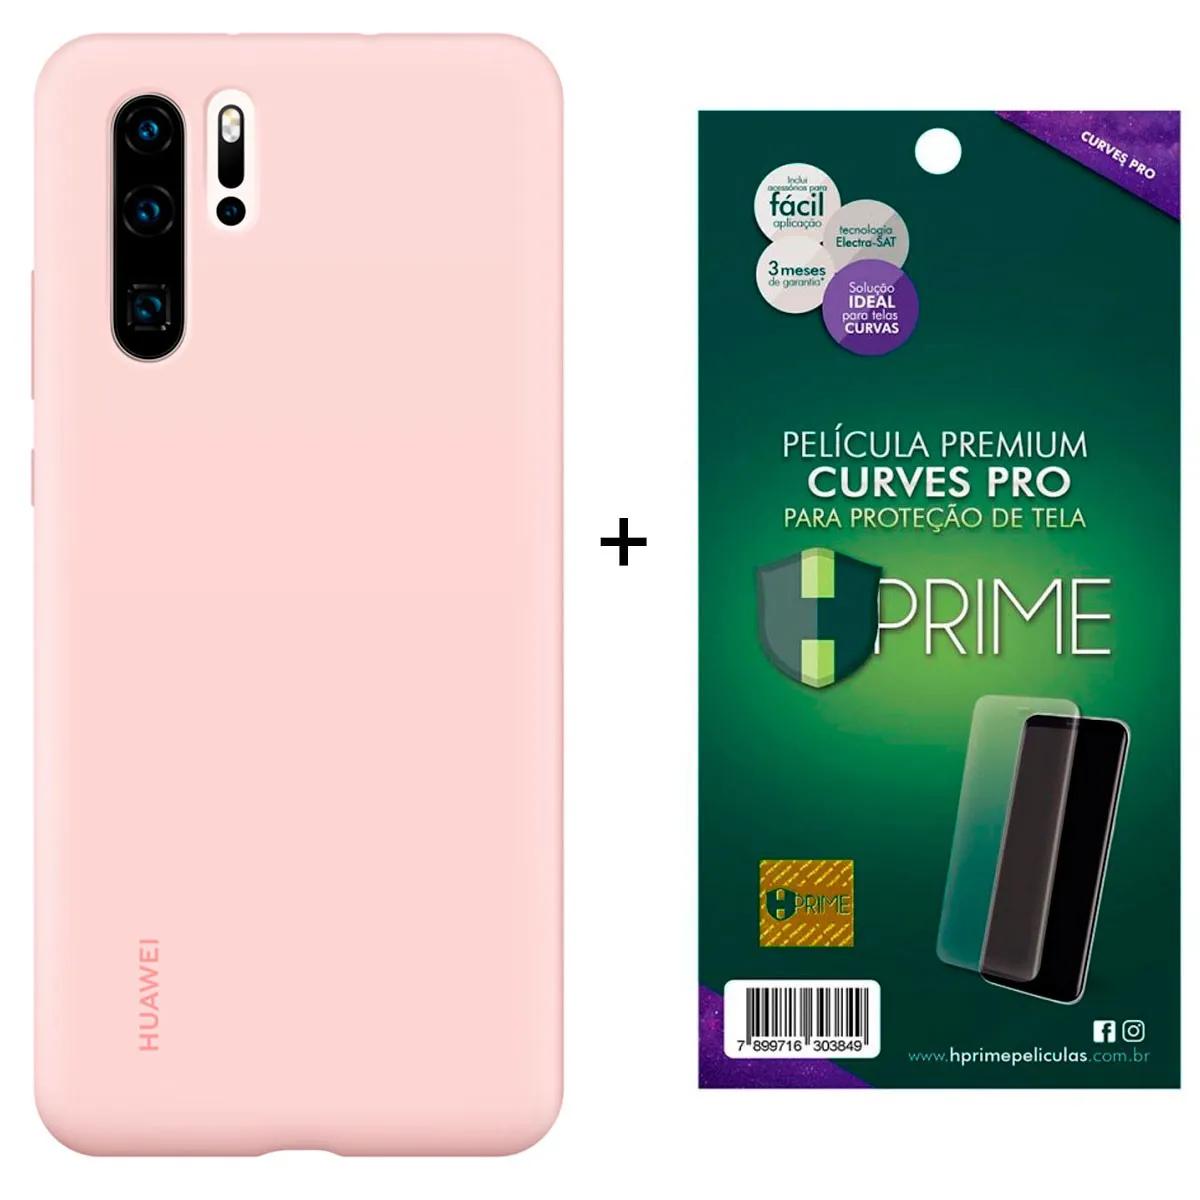 Capa Protetora Silicone Huawei P30 Pro Rosa Original + Película Premium Hprime Huawei P30 Pro - Curves Pro BRINDE